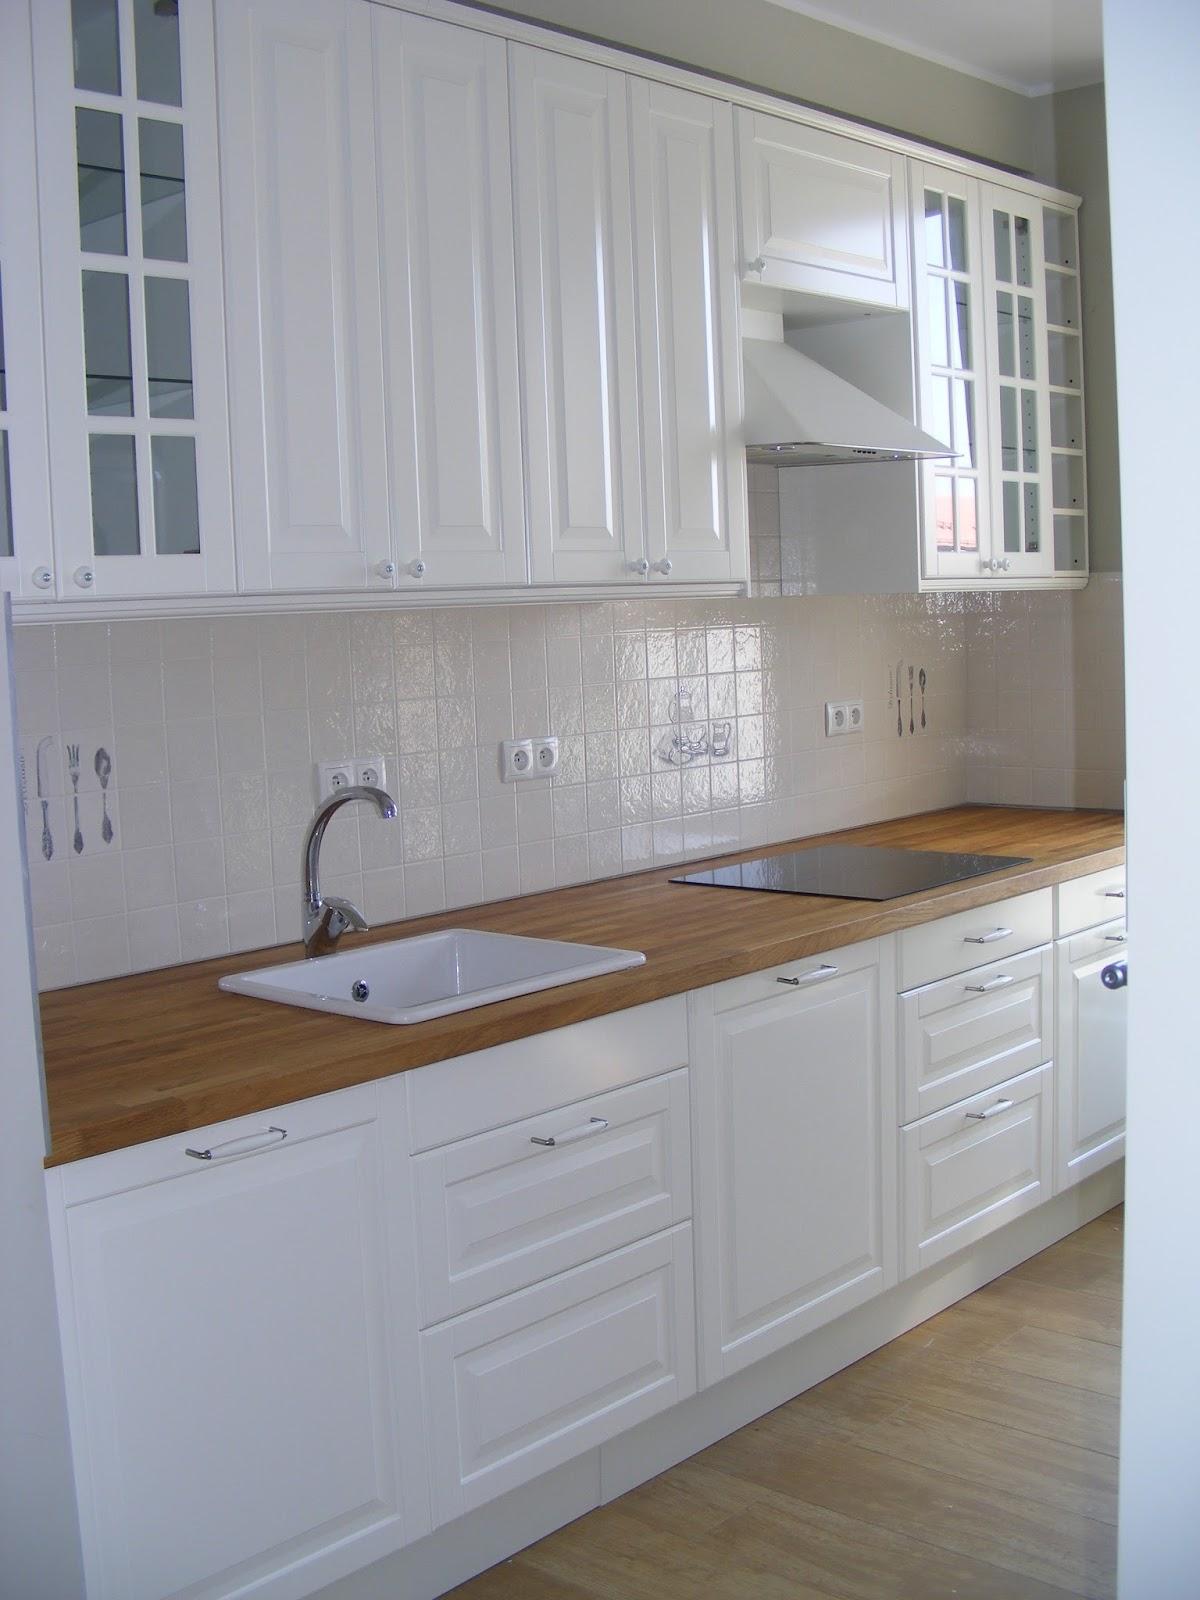 My Dream White Home Kuchnia Moich Marzen